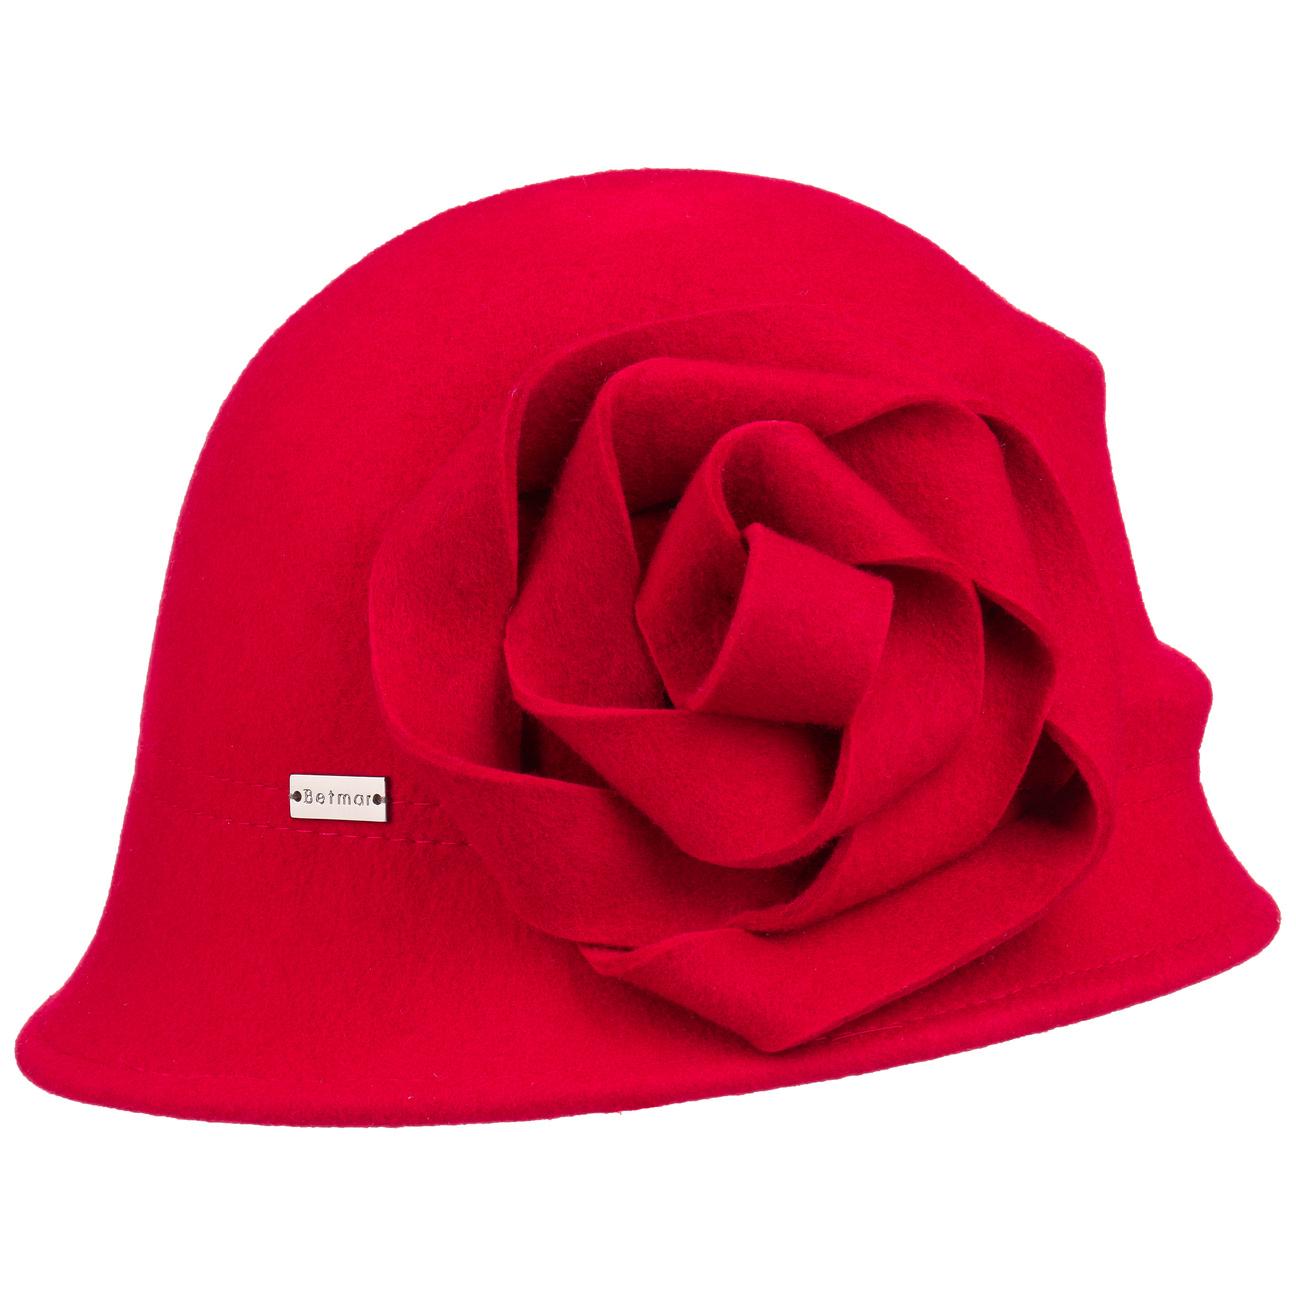 Sombrero Cloch? Alexandrite by Betmar  sombrero cloch